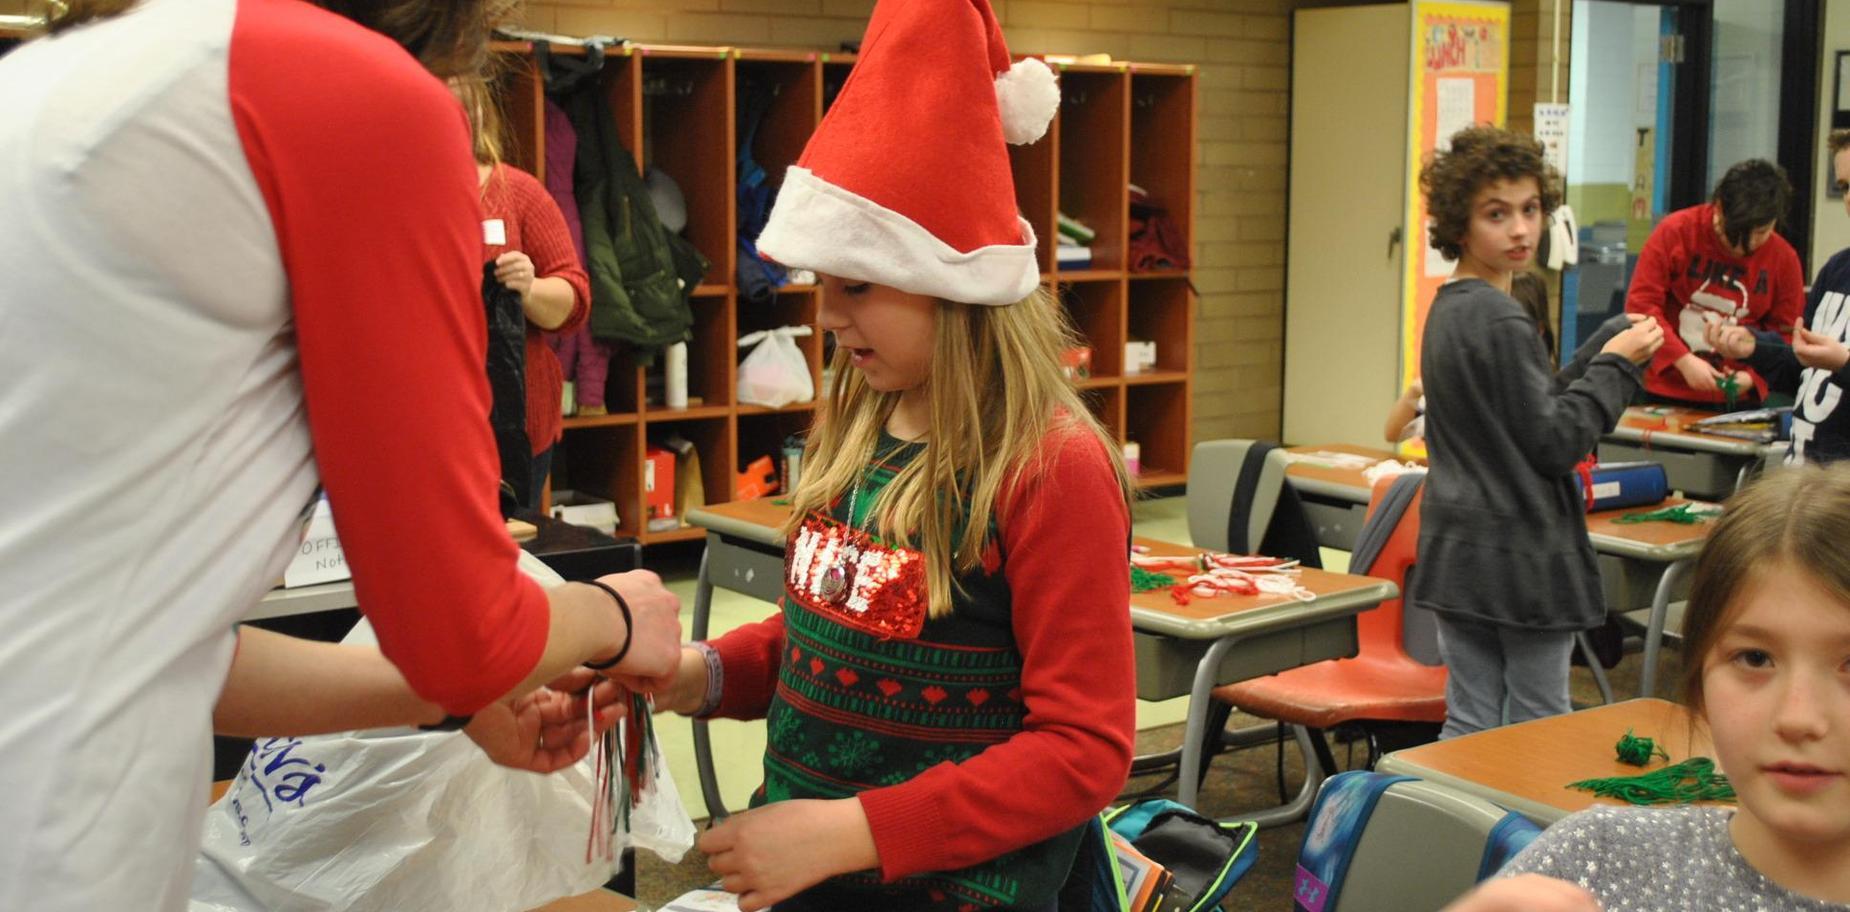 Students at Holiday Party